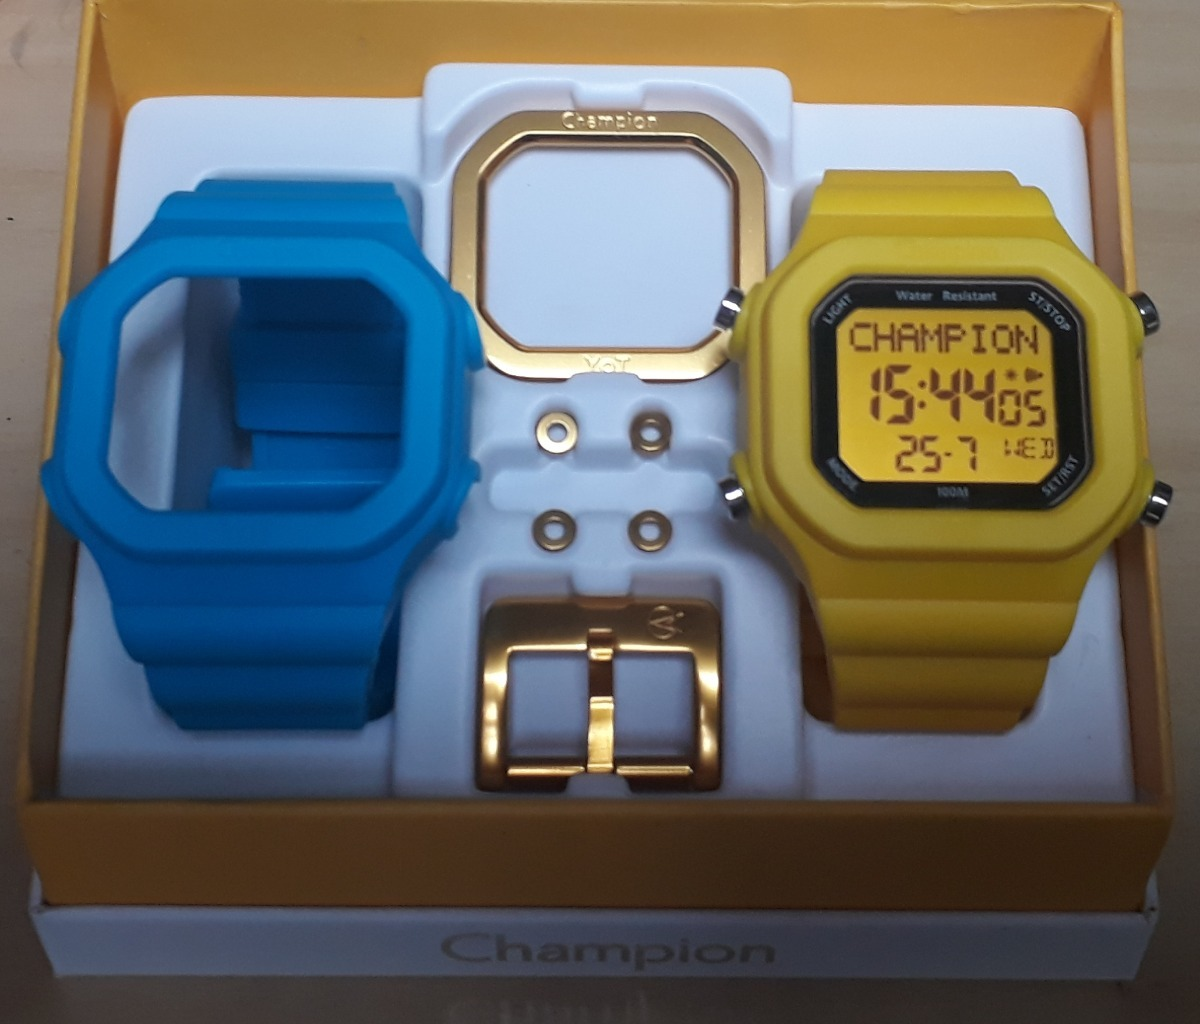 be4da2562fc Relogio Champion Yot Cp40180x Kit Azul Amarelo Dourado - R  149